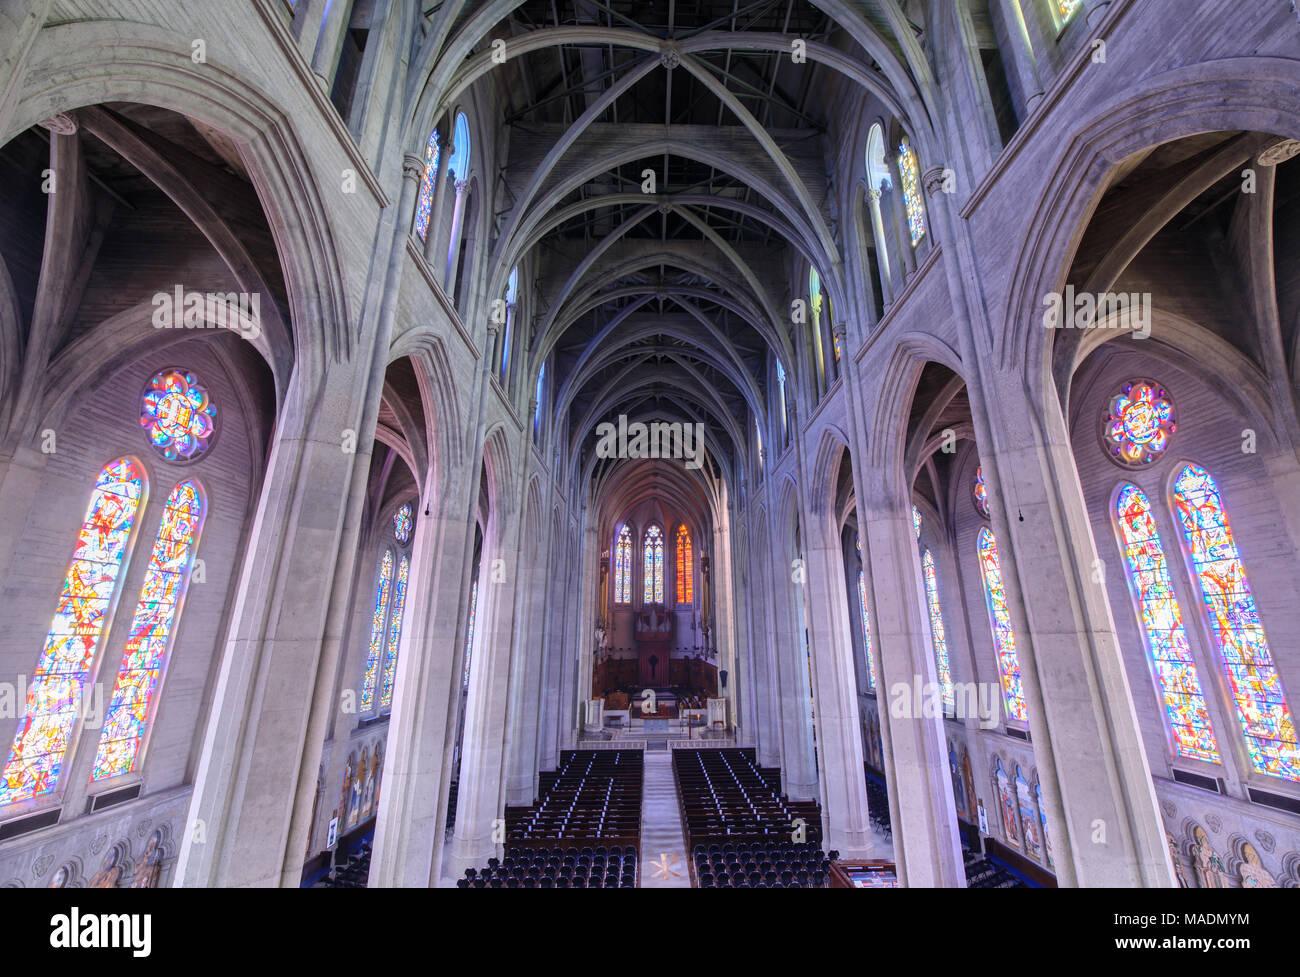 Grace Cathedral San Francisco Interior Stock Photos & Grace